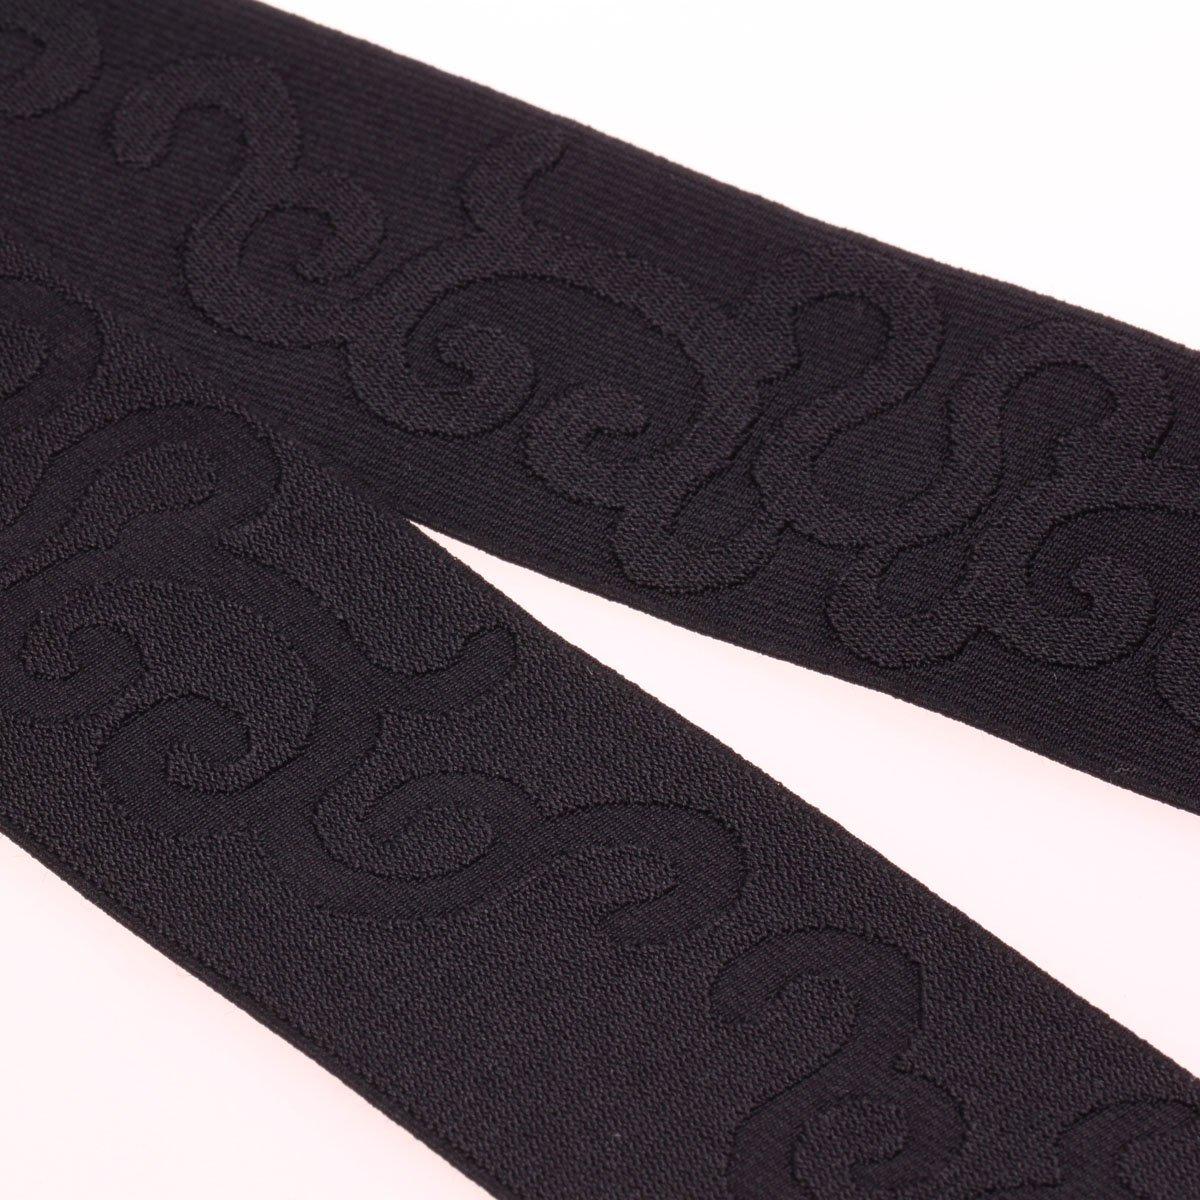 COTOWIN 2-inch Wide Black Jacquard Elastic Band by 3 Yard, Waistband Elastic, Palace Flower Elastic Trim, Stretchy Elastic Ribbon 4337000466